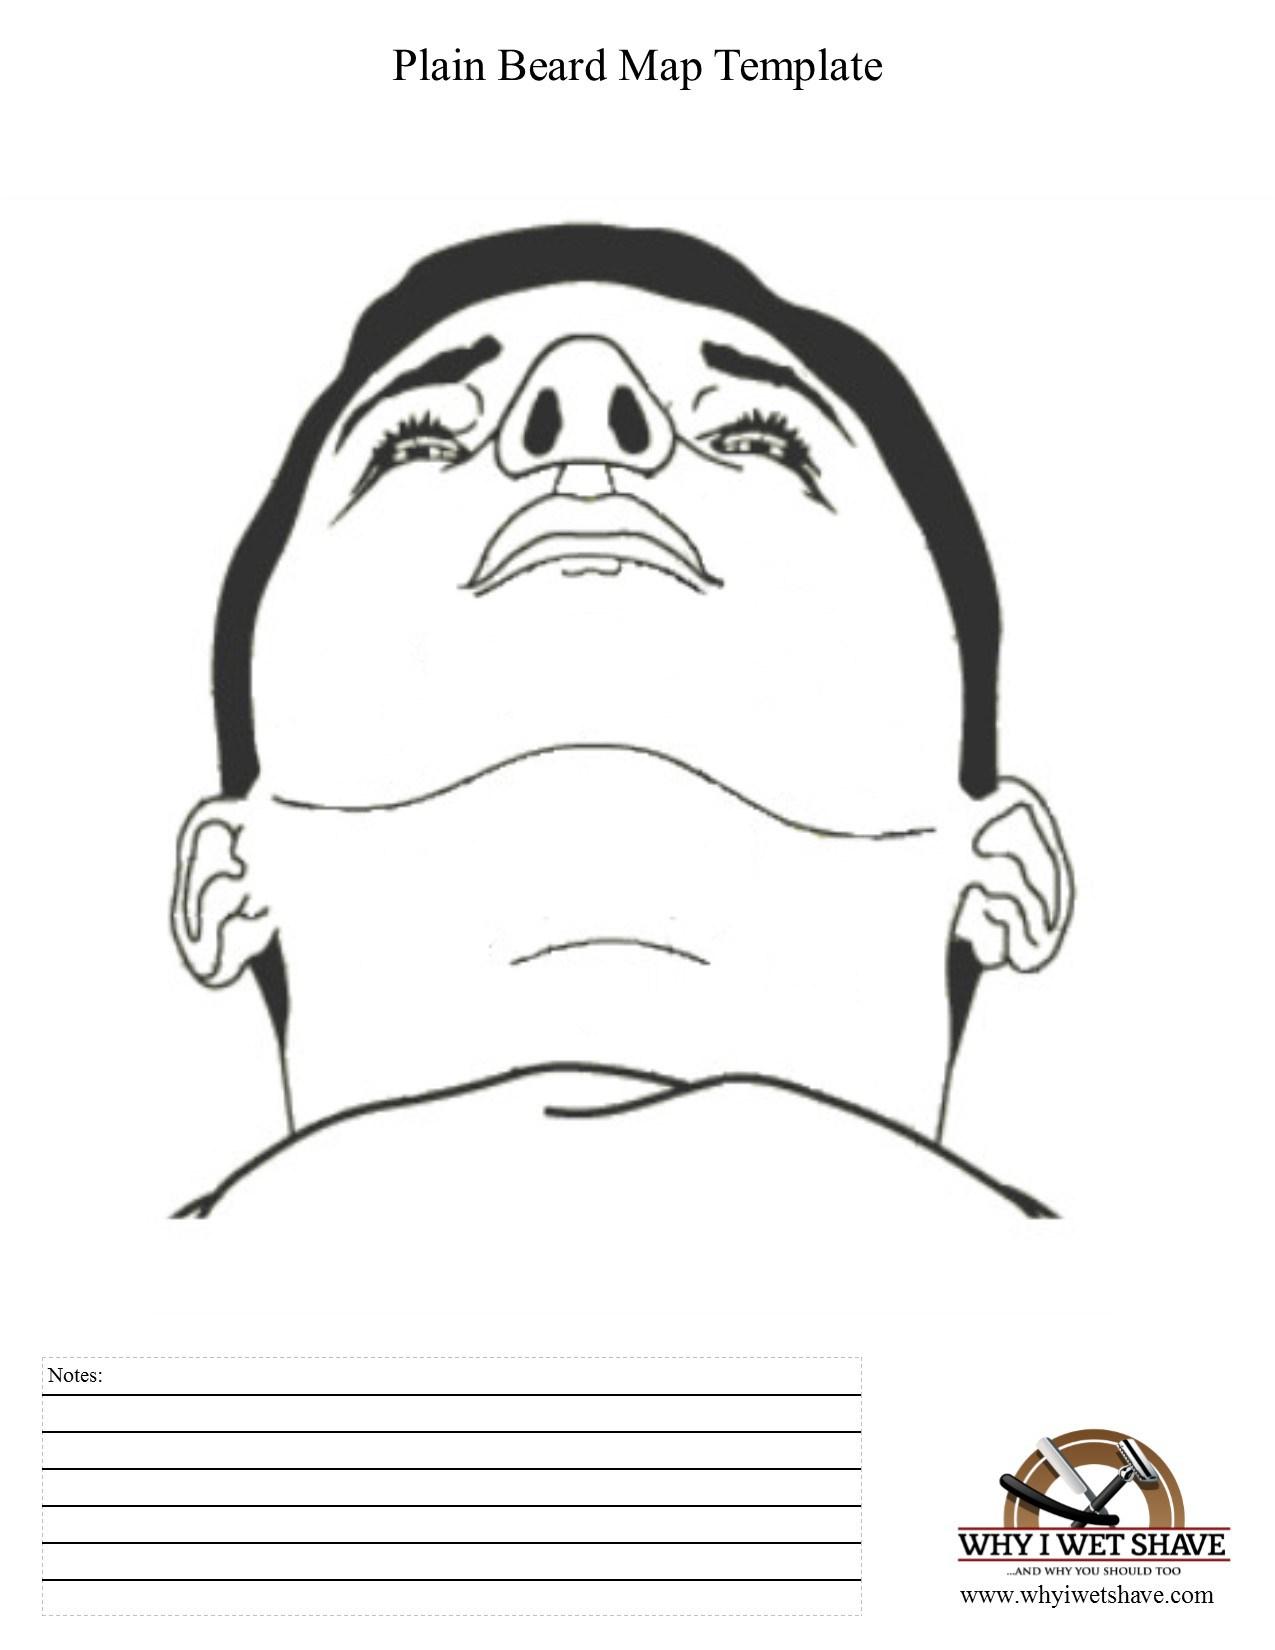 Basics of Shaving: Beard Mapping.